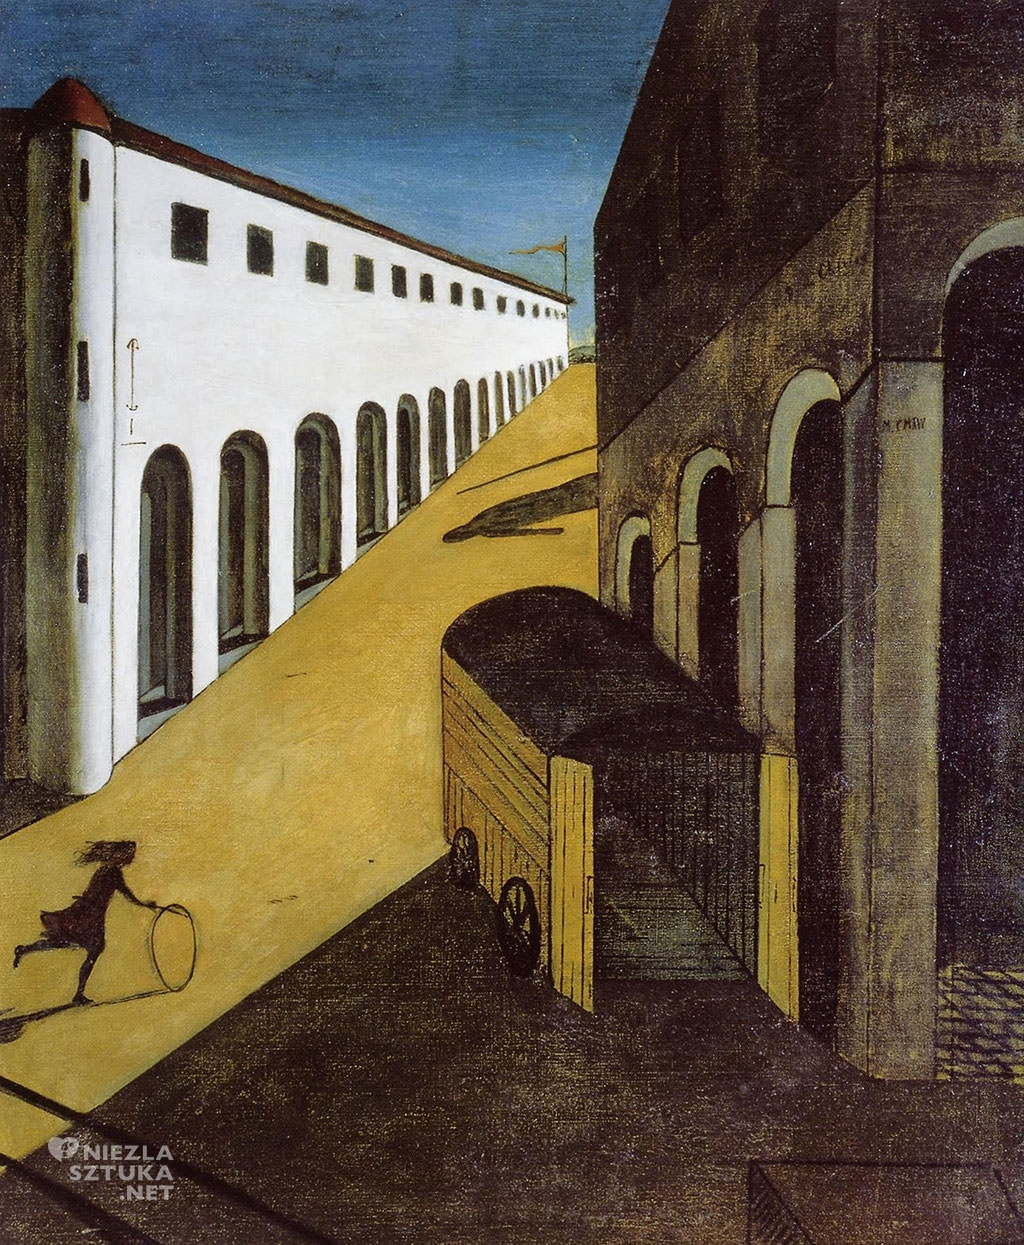 Giorgio de Chirico, surrealizm, melancholia i tajemnica ulicy, Niezła sztuka